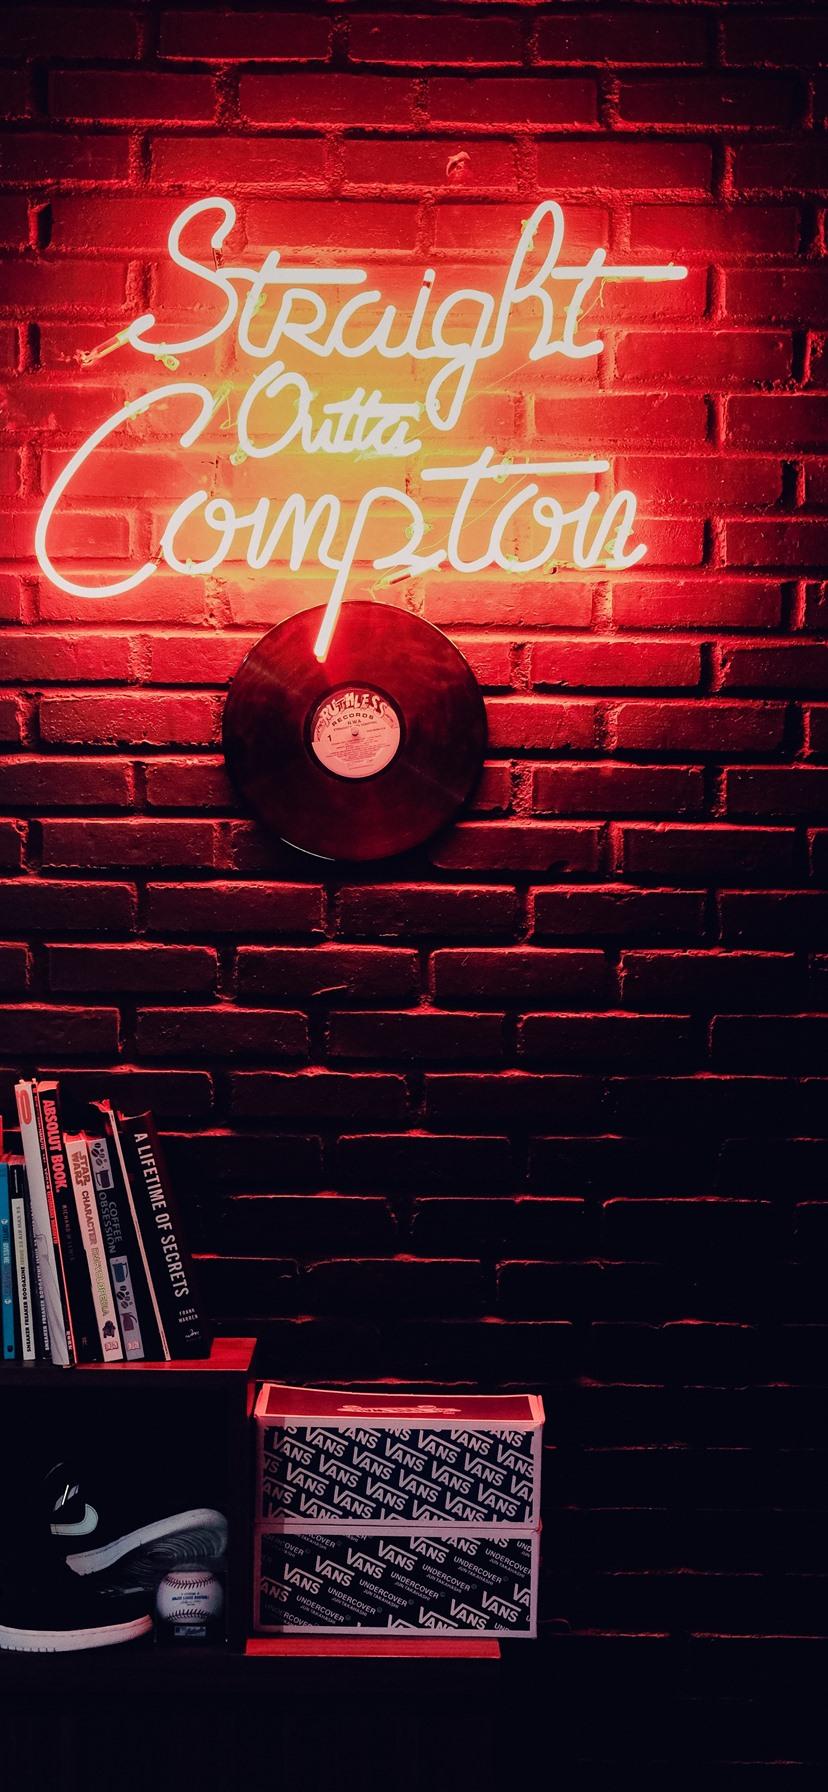 Books, vinyl record, wall, neon light ...